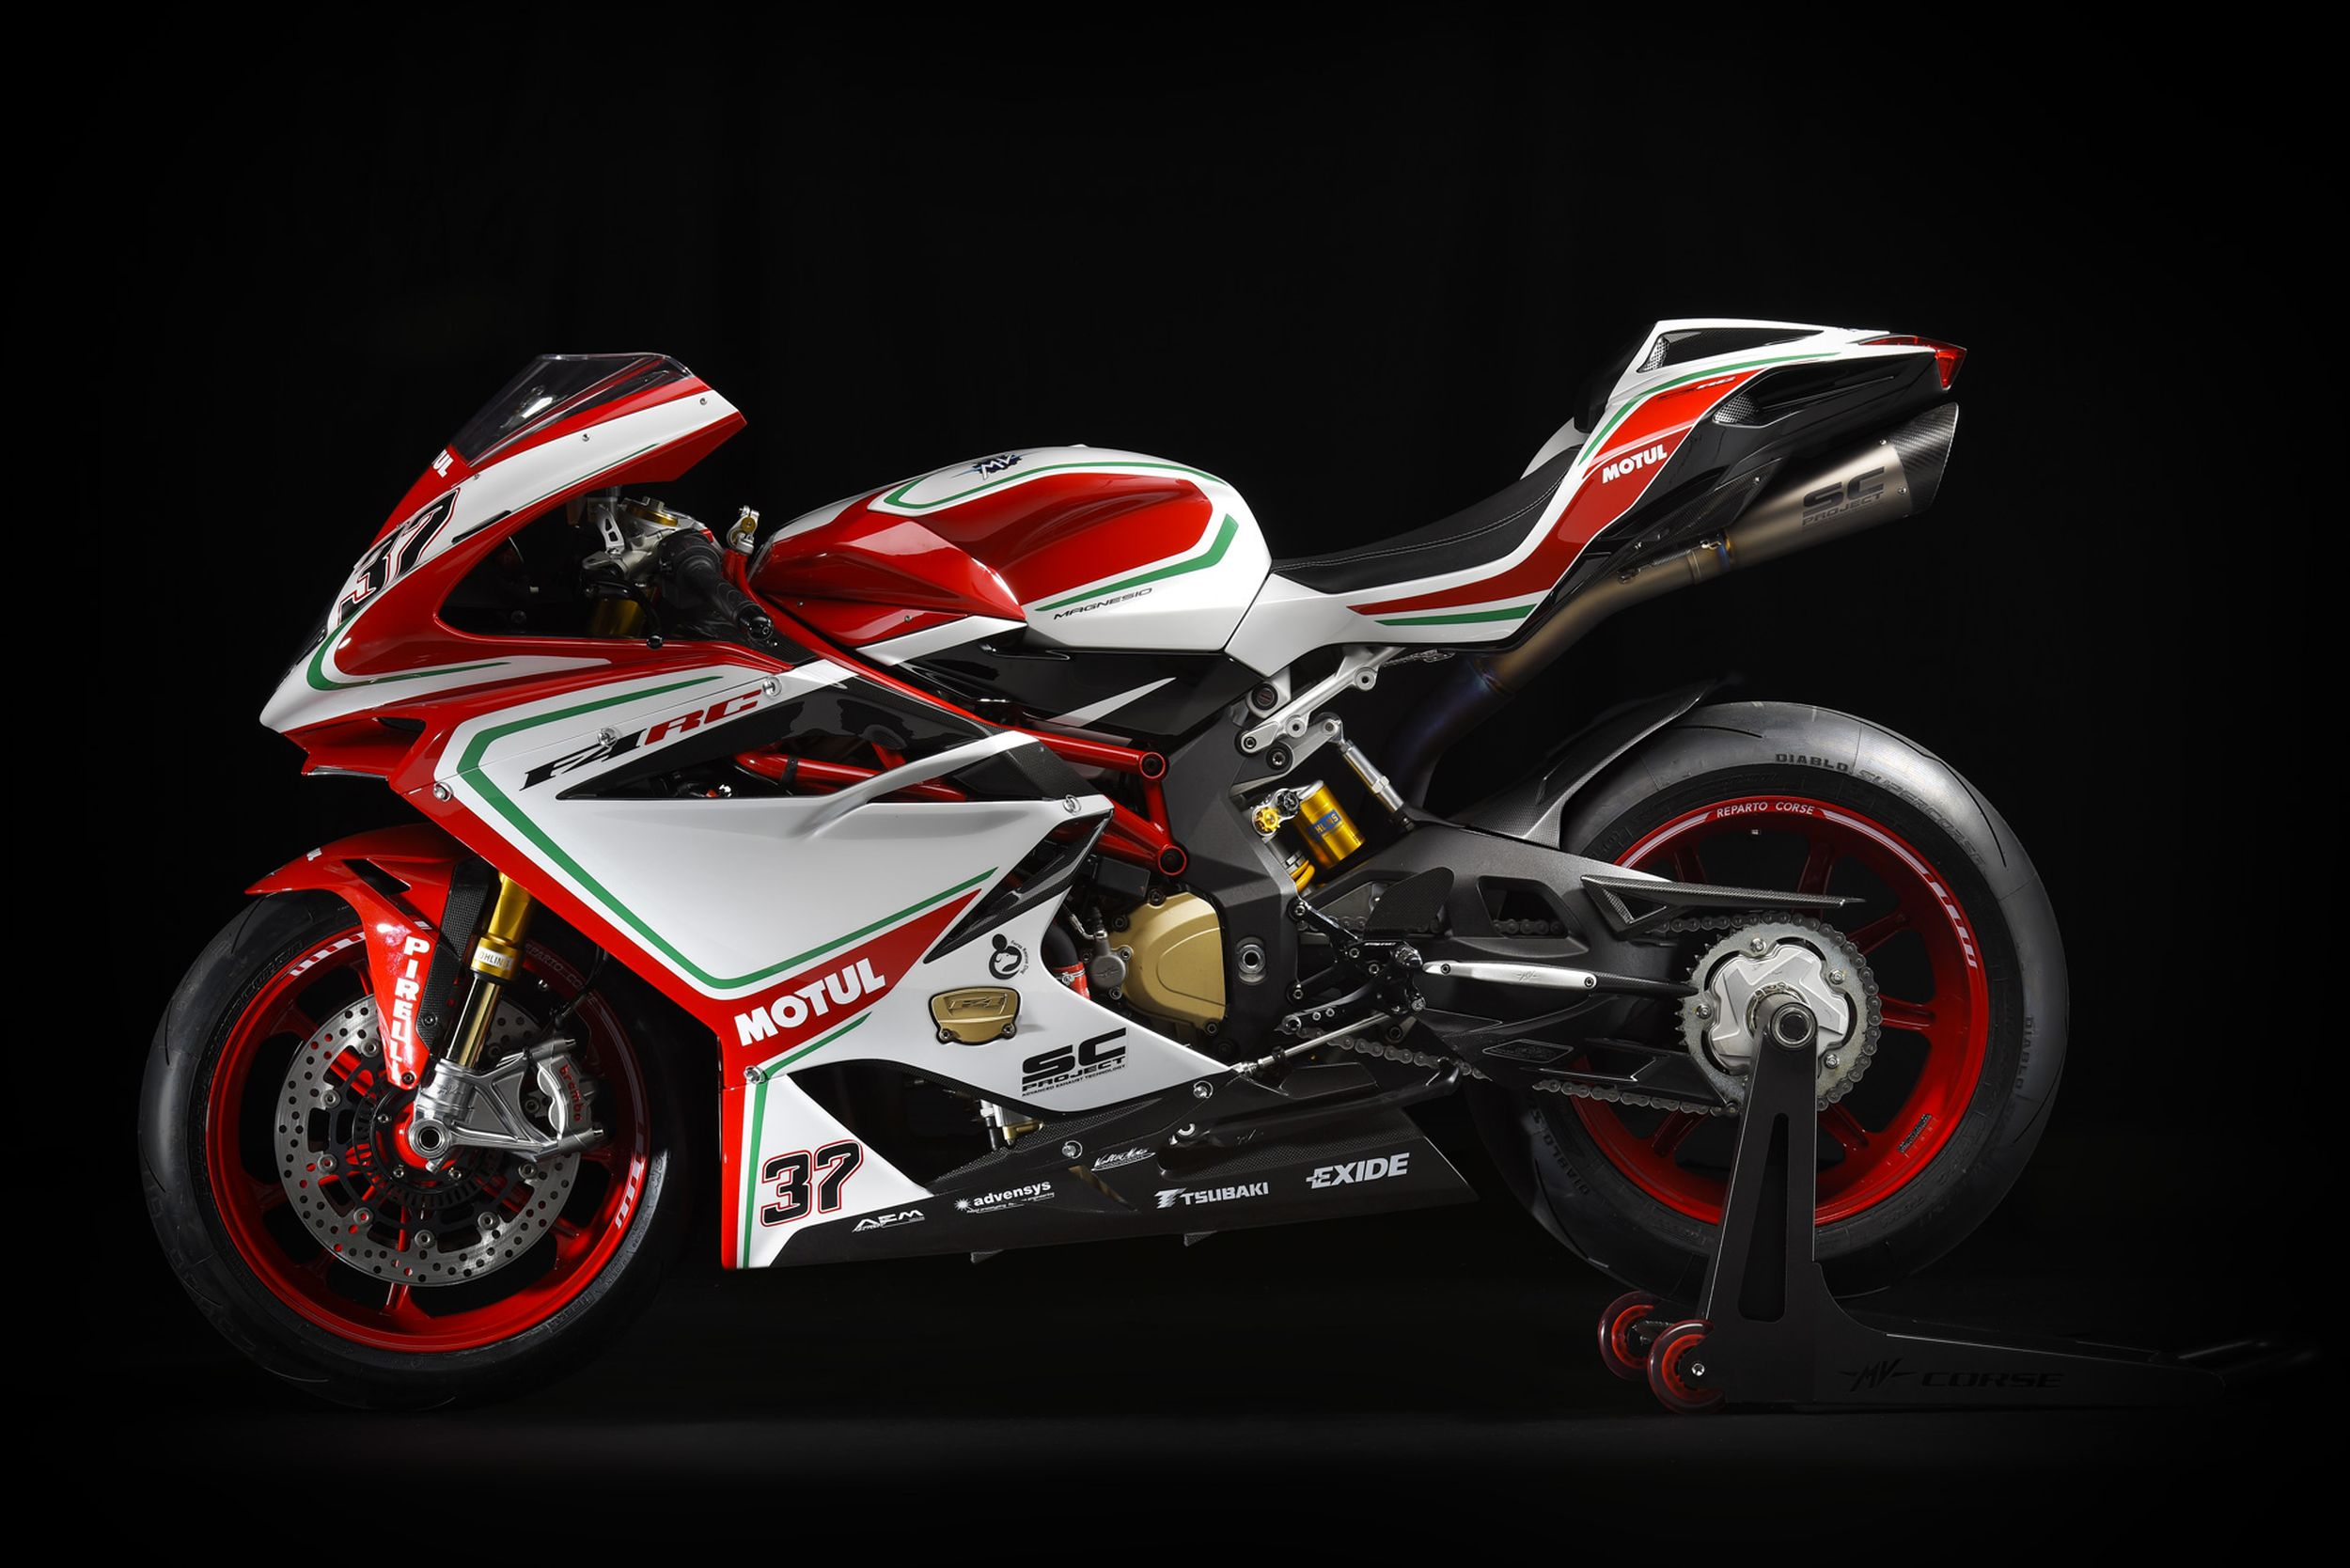 Suzuki Motorcycle India Price